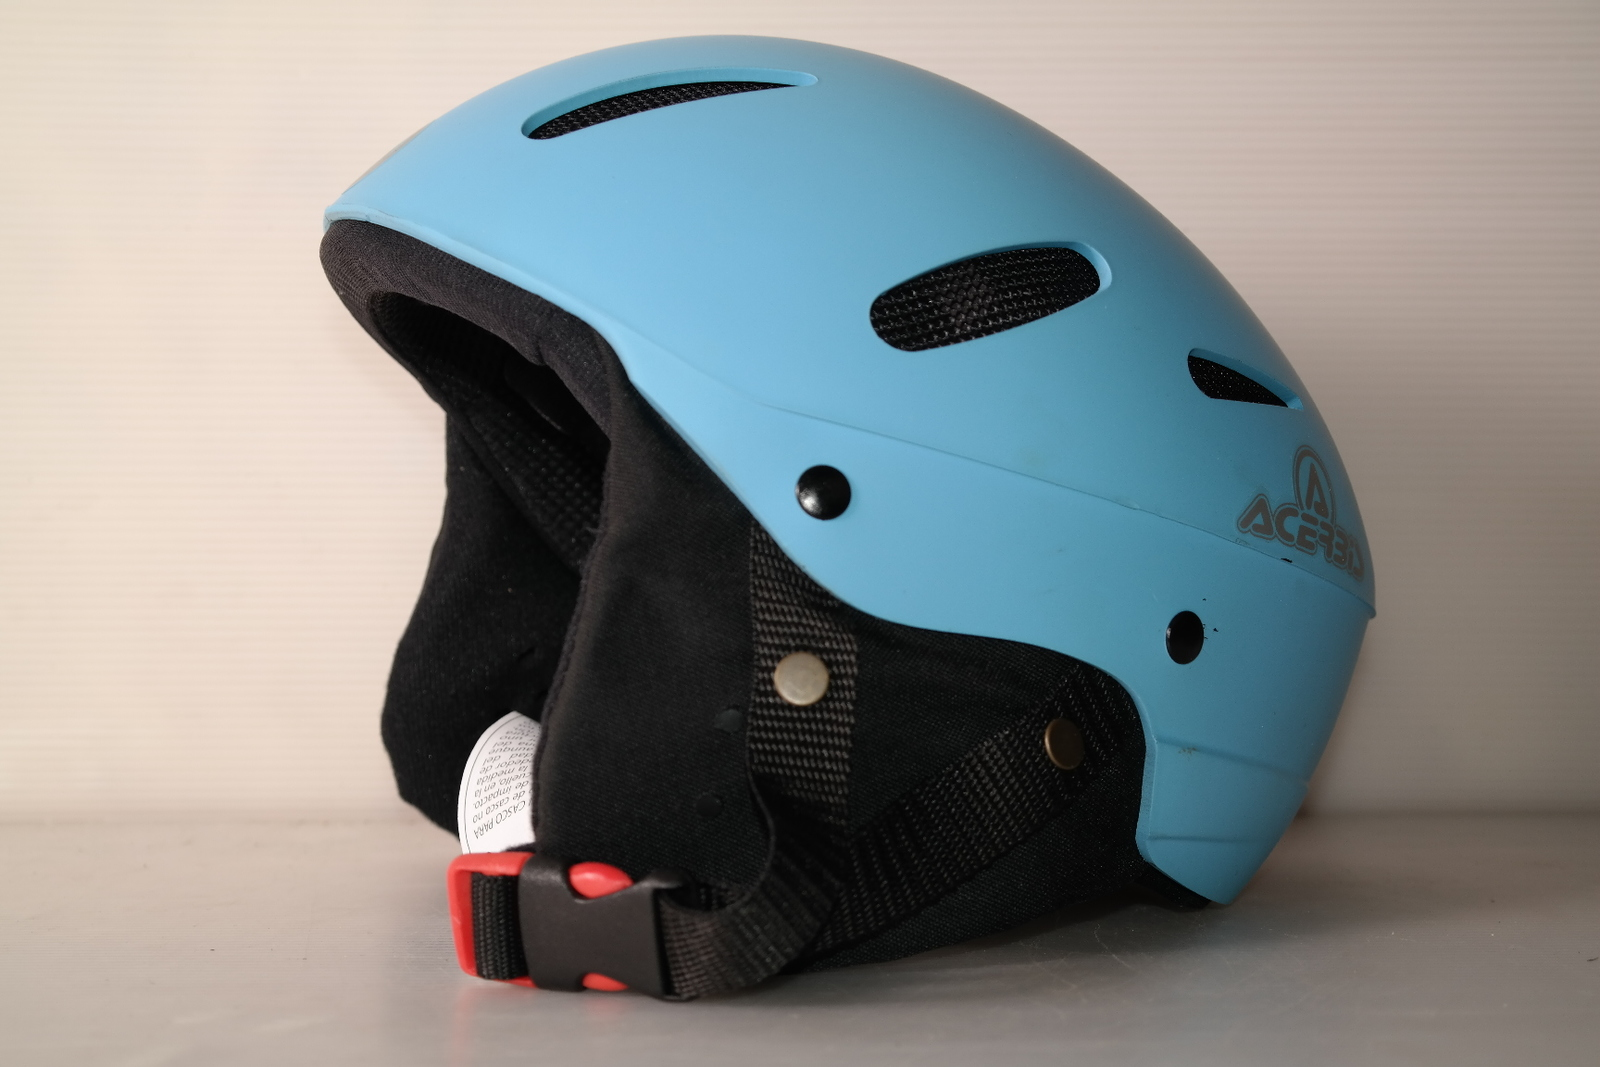 Dámská lyžařská helma Acerbis Azzurro Gomato vel. 60